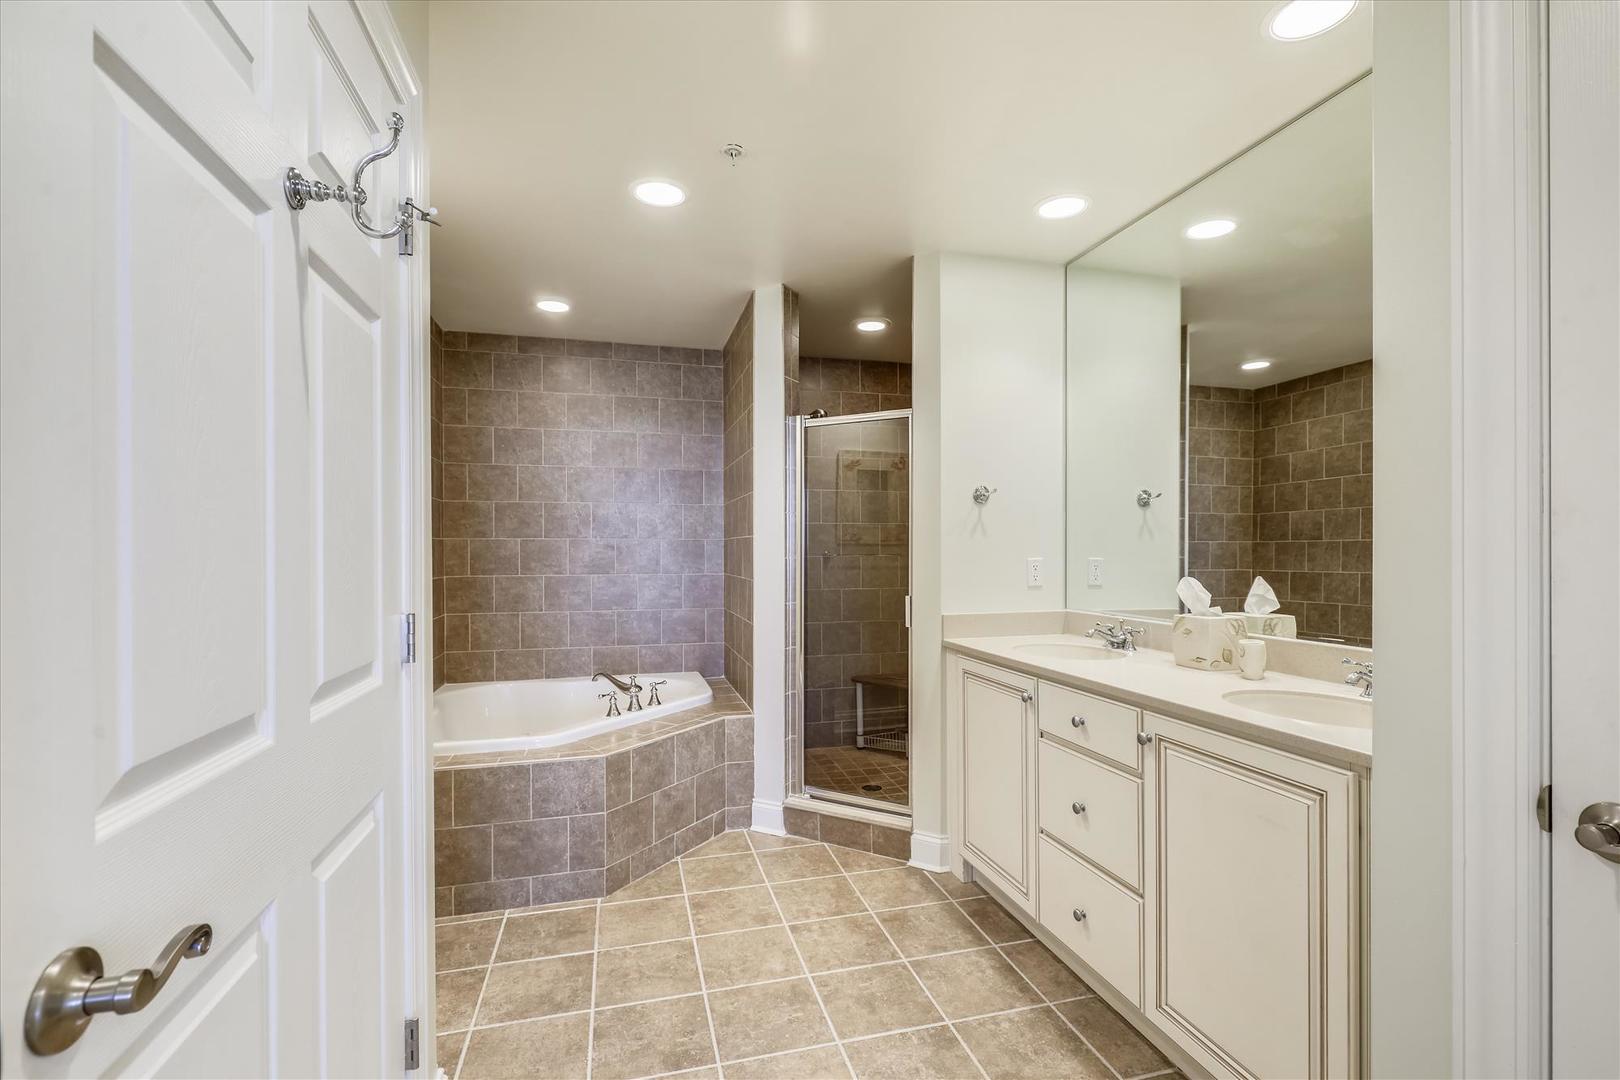 South Beach 304 - Master Bathroom